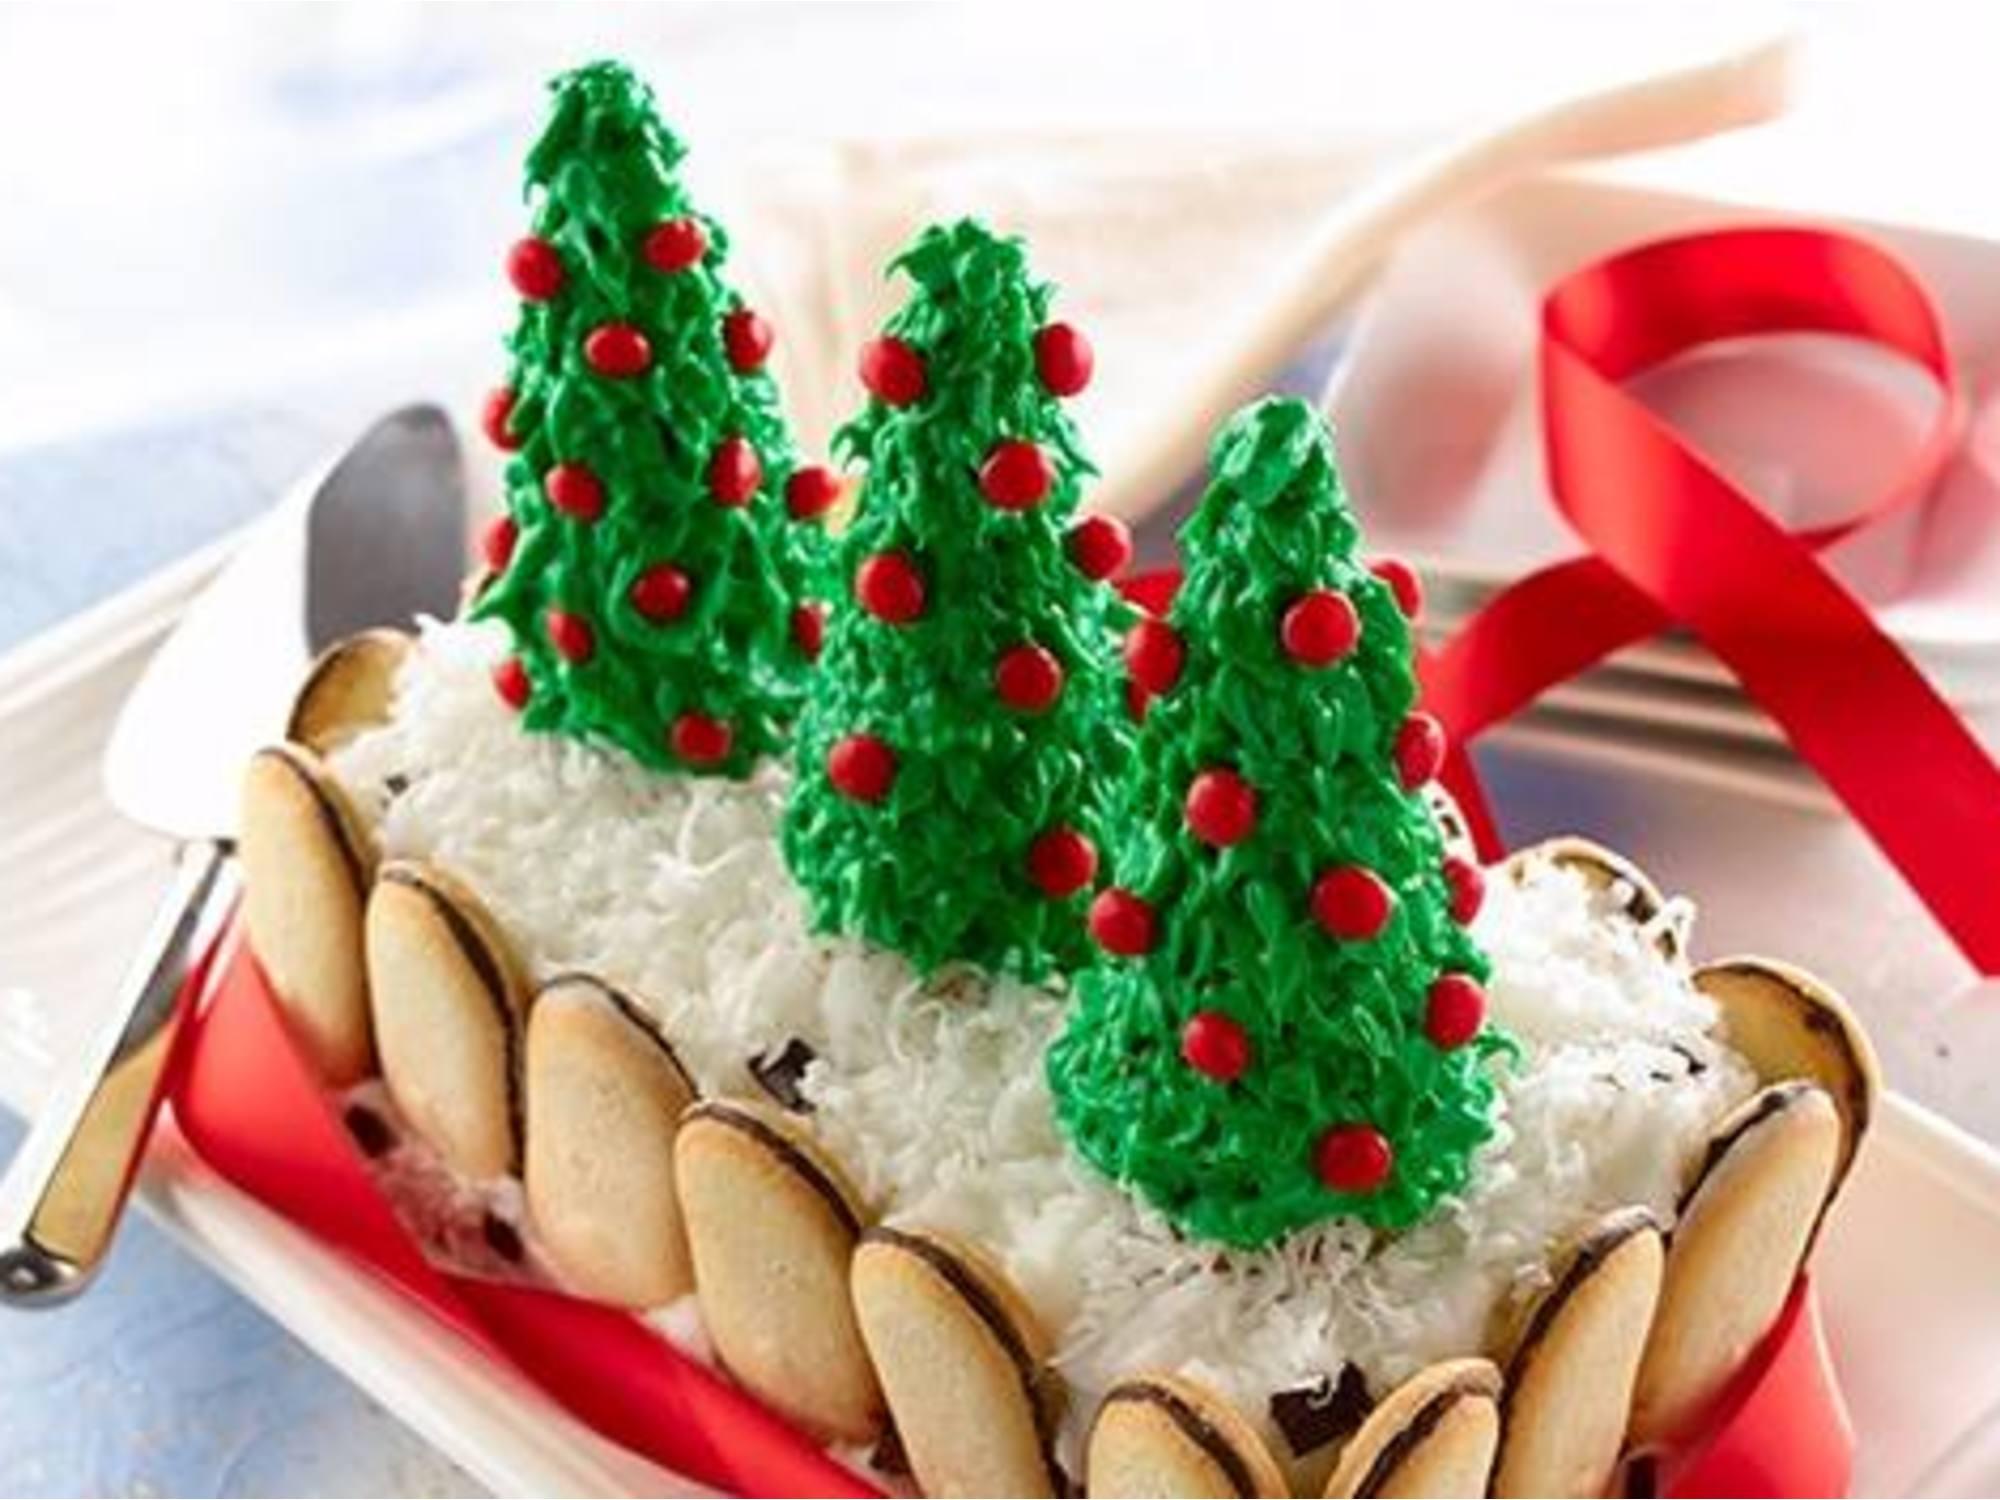 Minty Christmas Ice Cream Cake